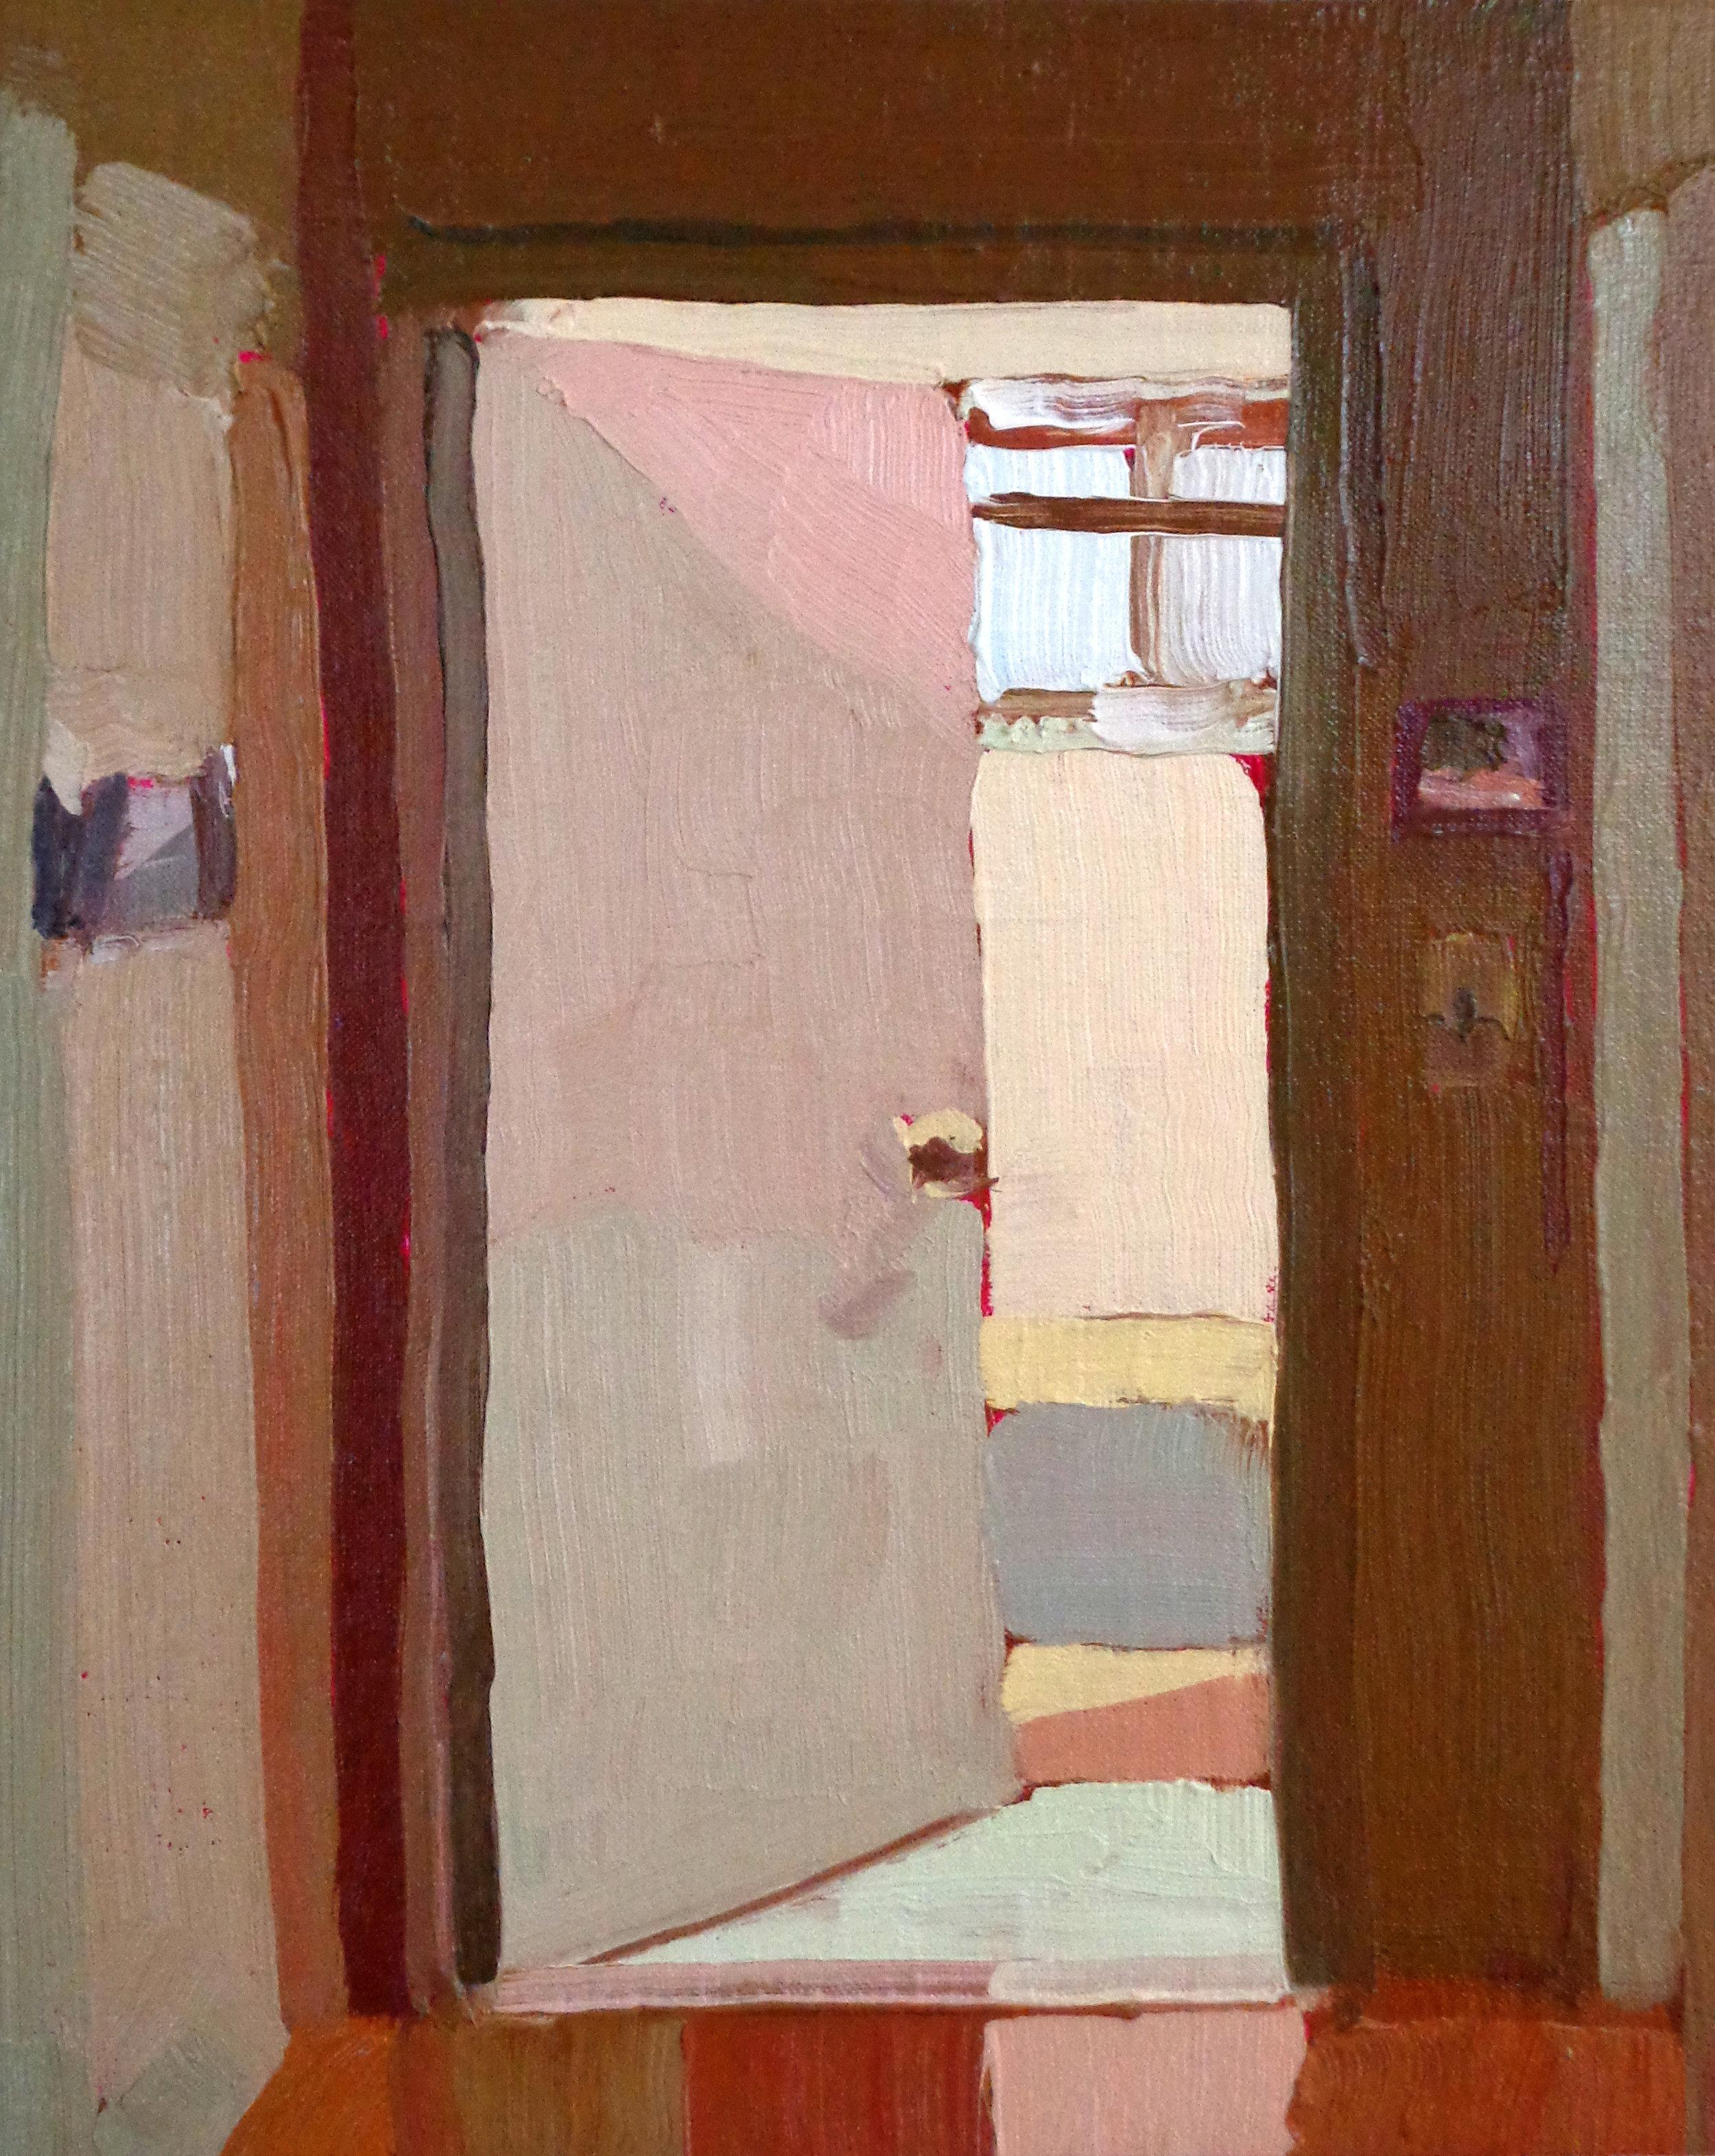 Keiran Brennan Hinton,Bathroom Door, 2016, oil on linen, 10 x 8 inches  SOLD